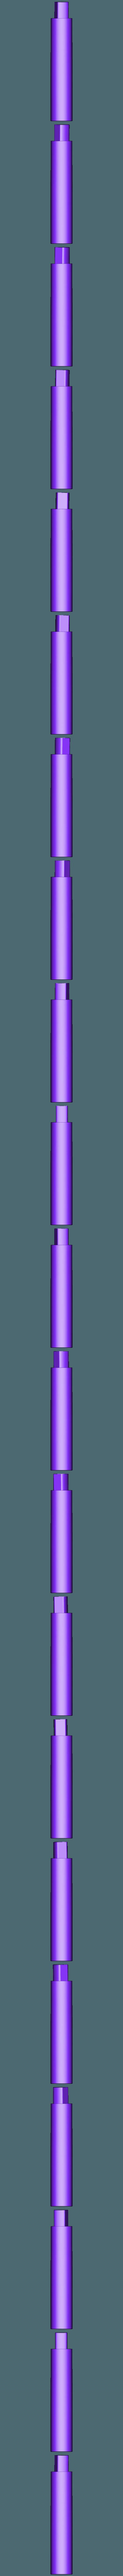 Part6.stl Download OBJ file AXE-Warhammer • Object to 3D print, Bstar3Dart